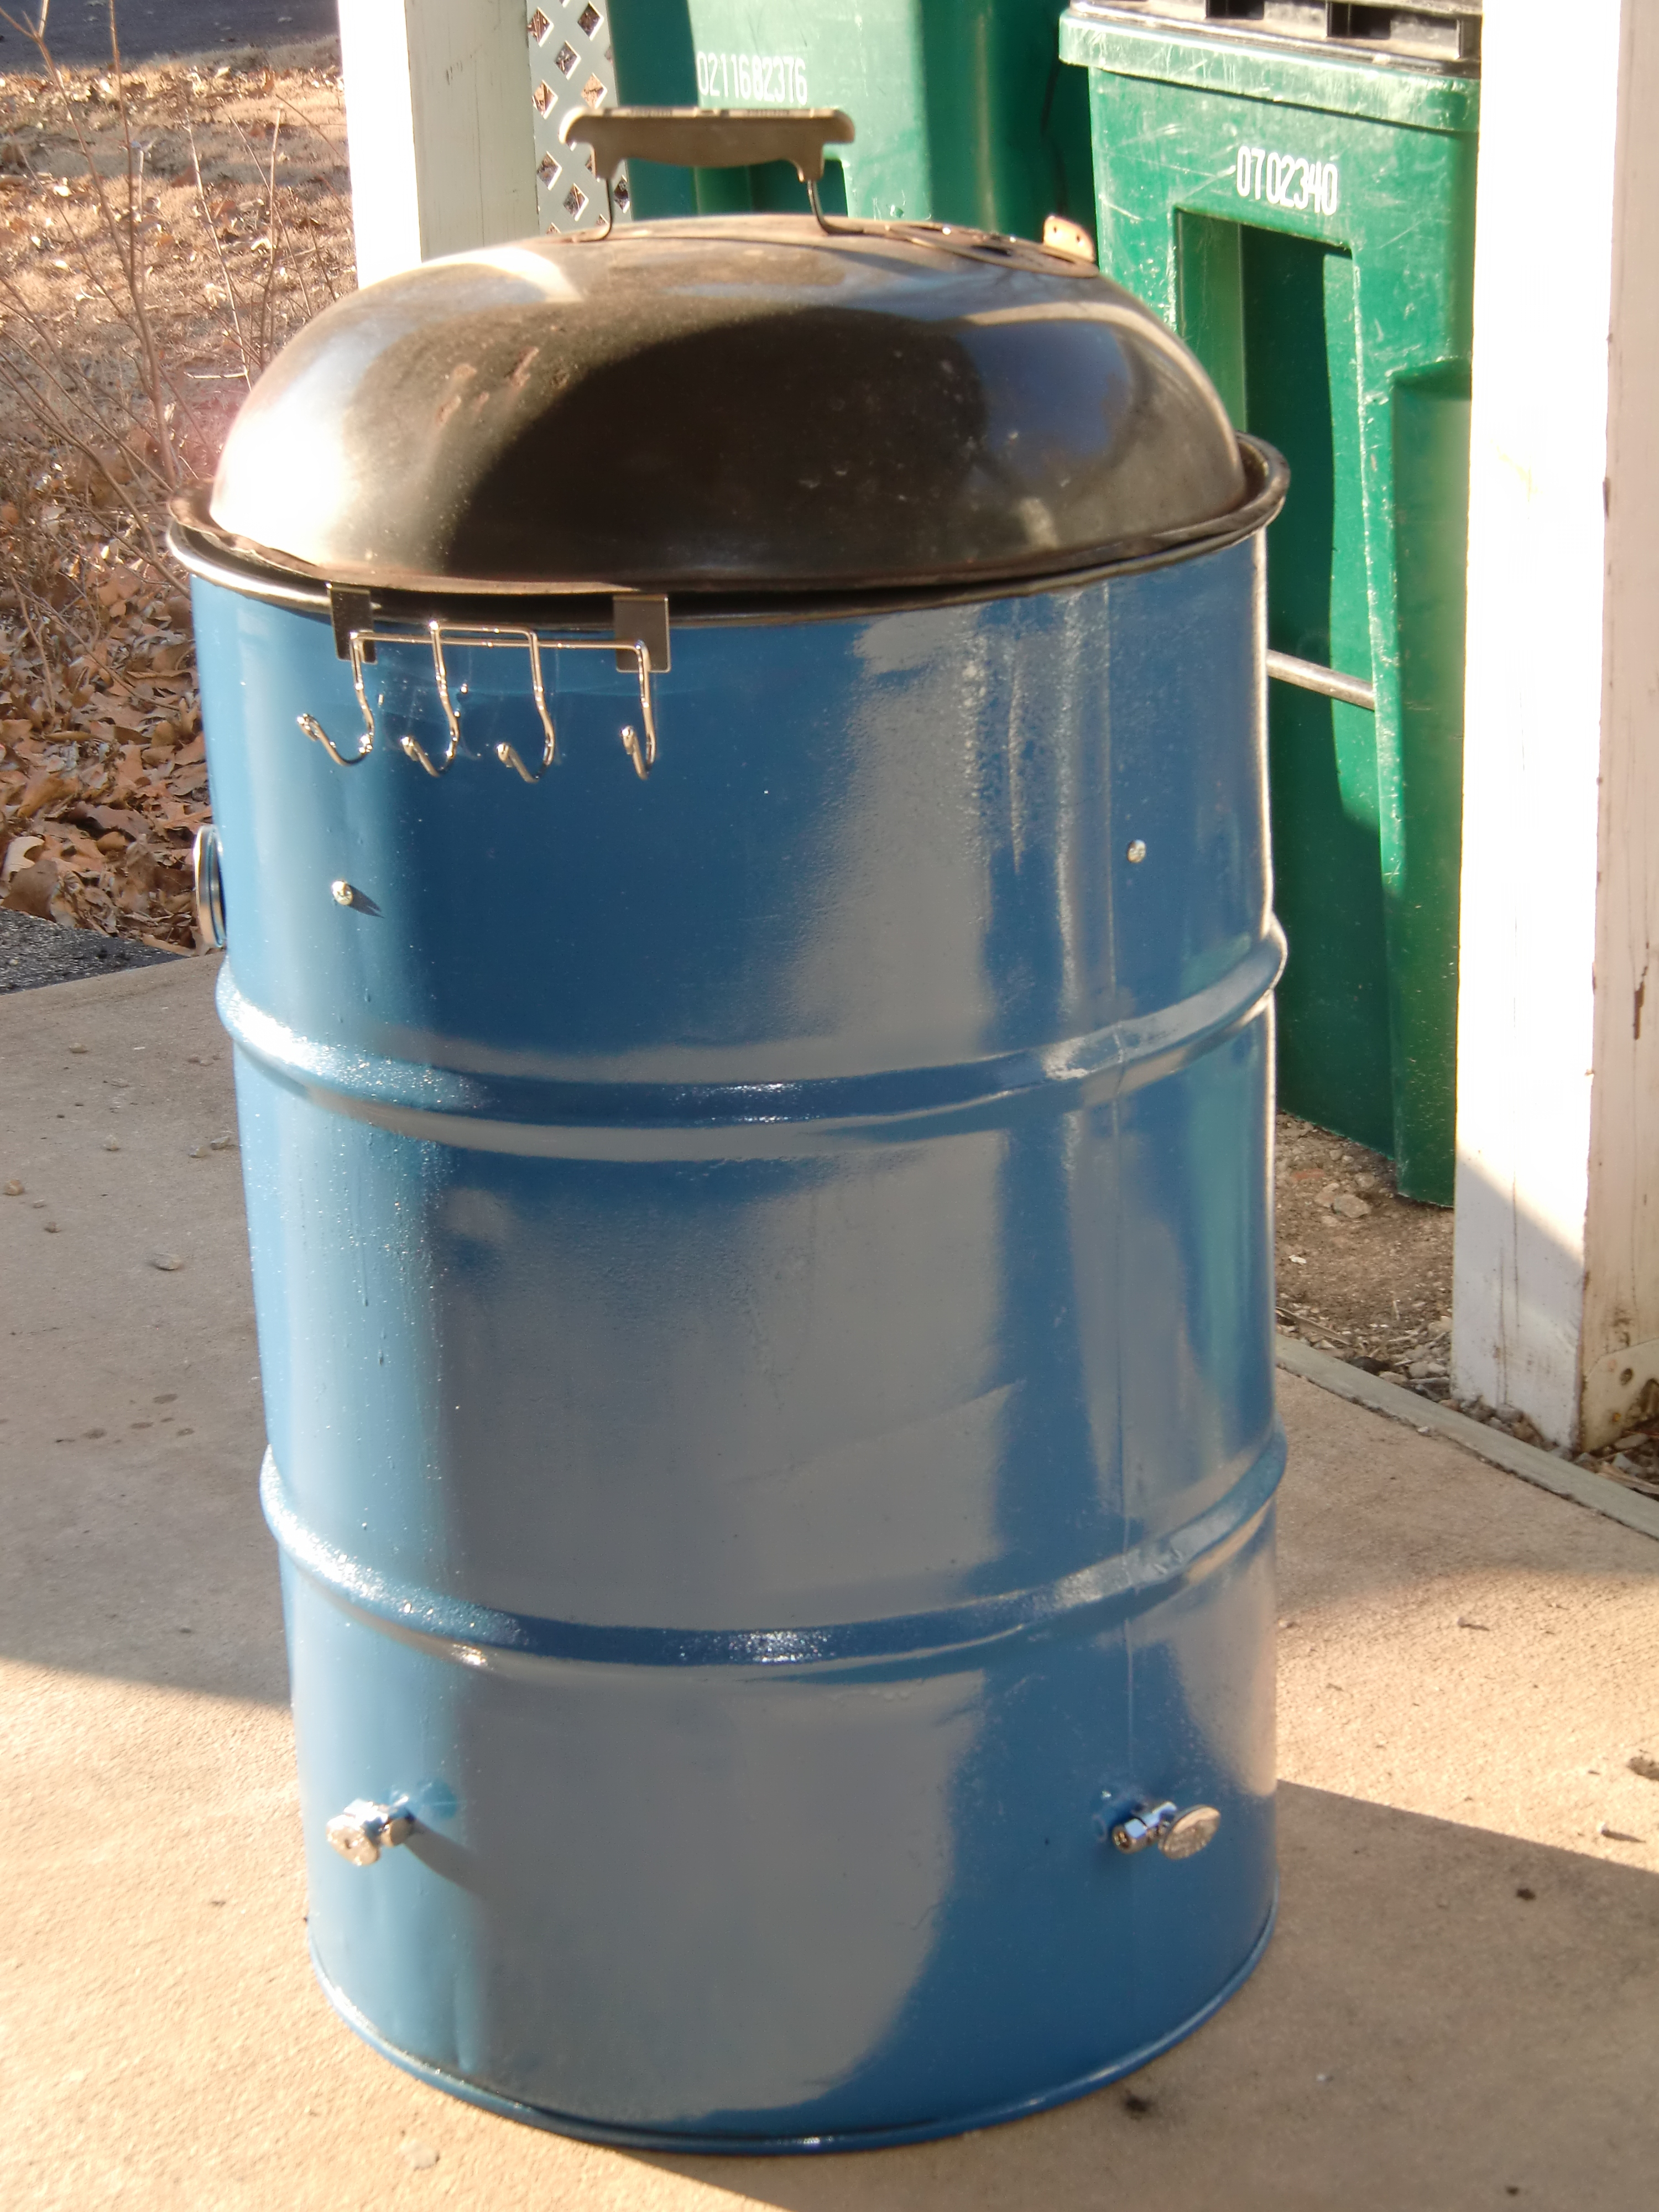 Making A 55 Gallon Steel Drum Into BBQ Smoker Simpson Bbq